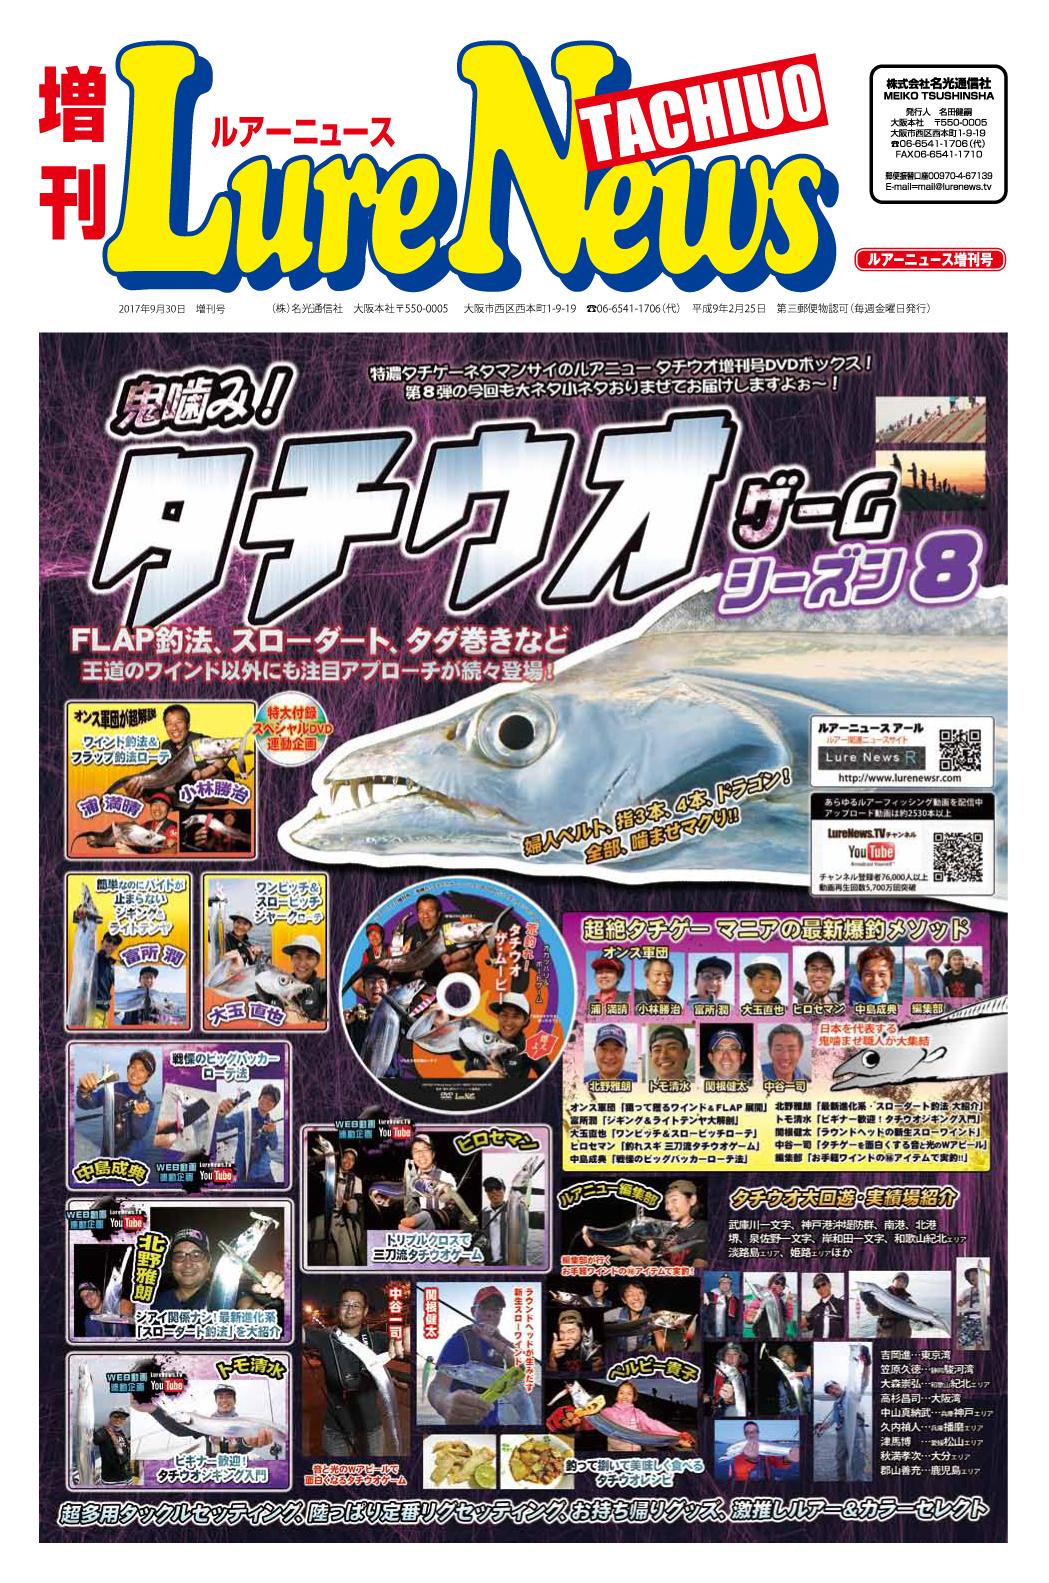 http://lurenews.tv/tachiuo8_shinbun.jpg